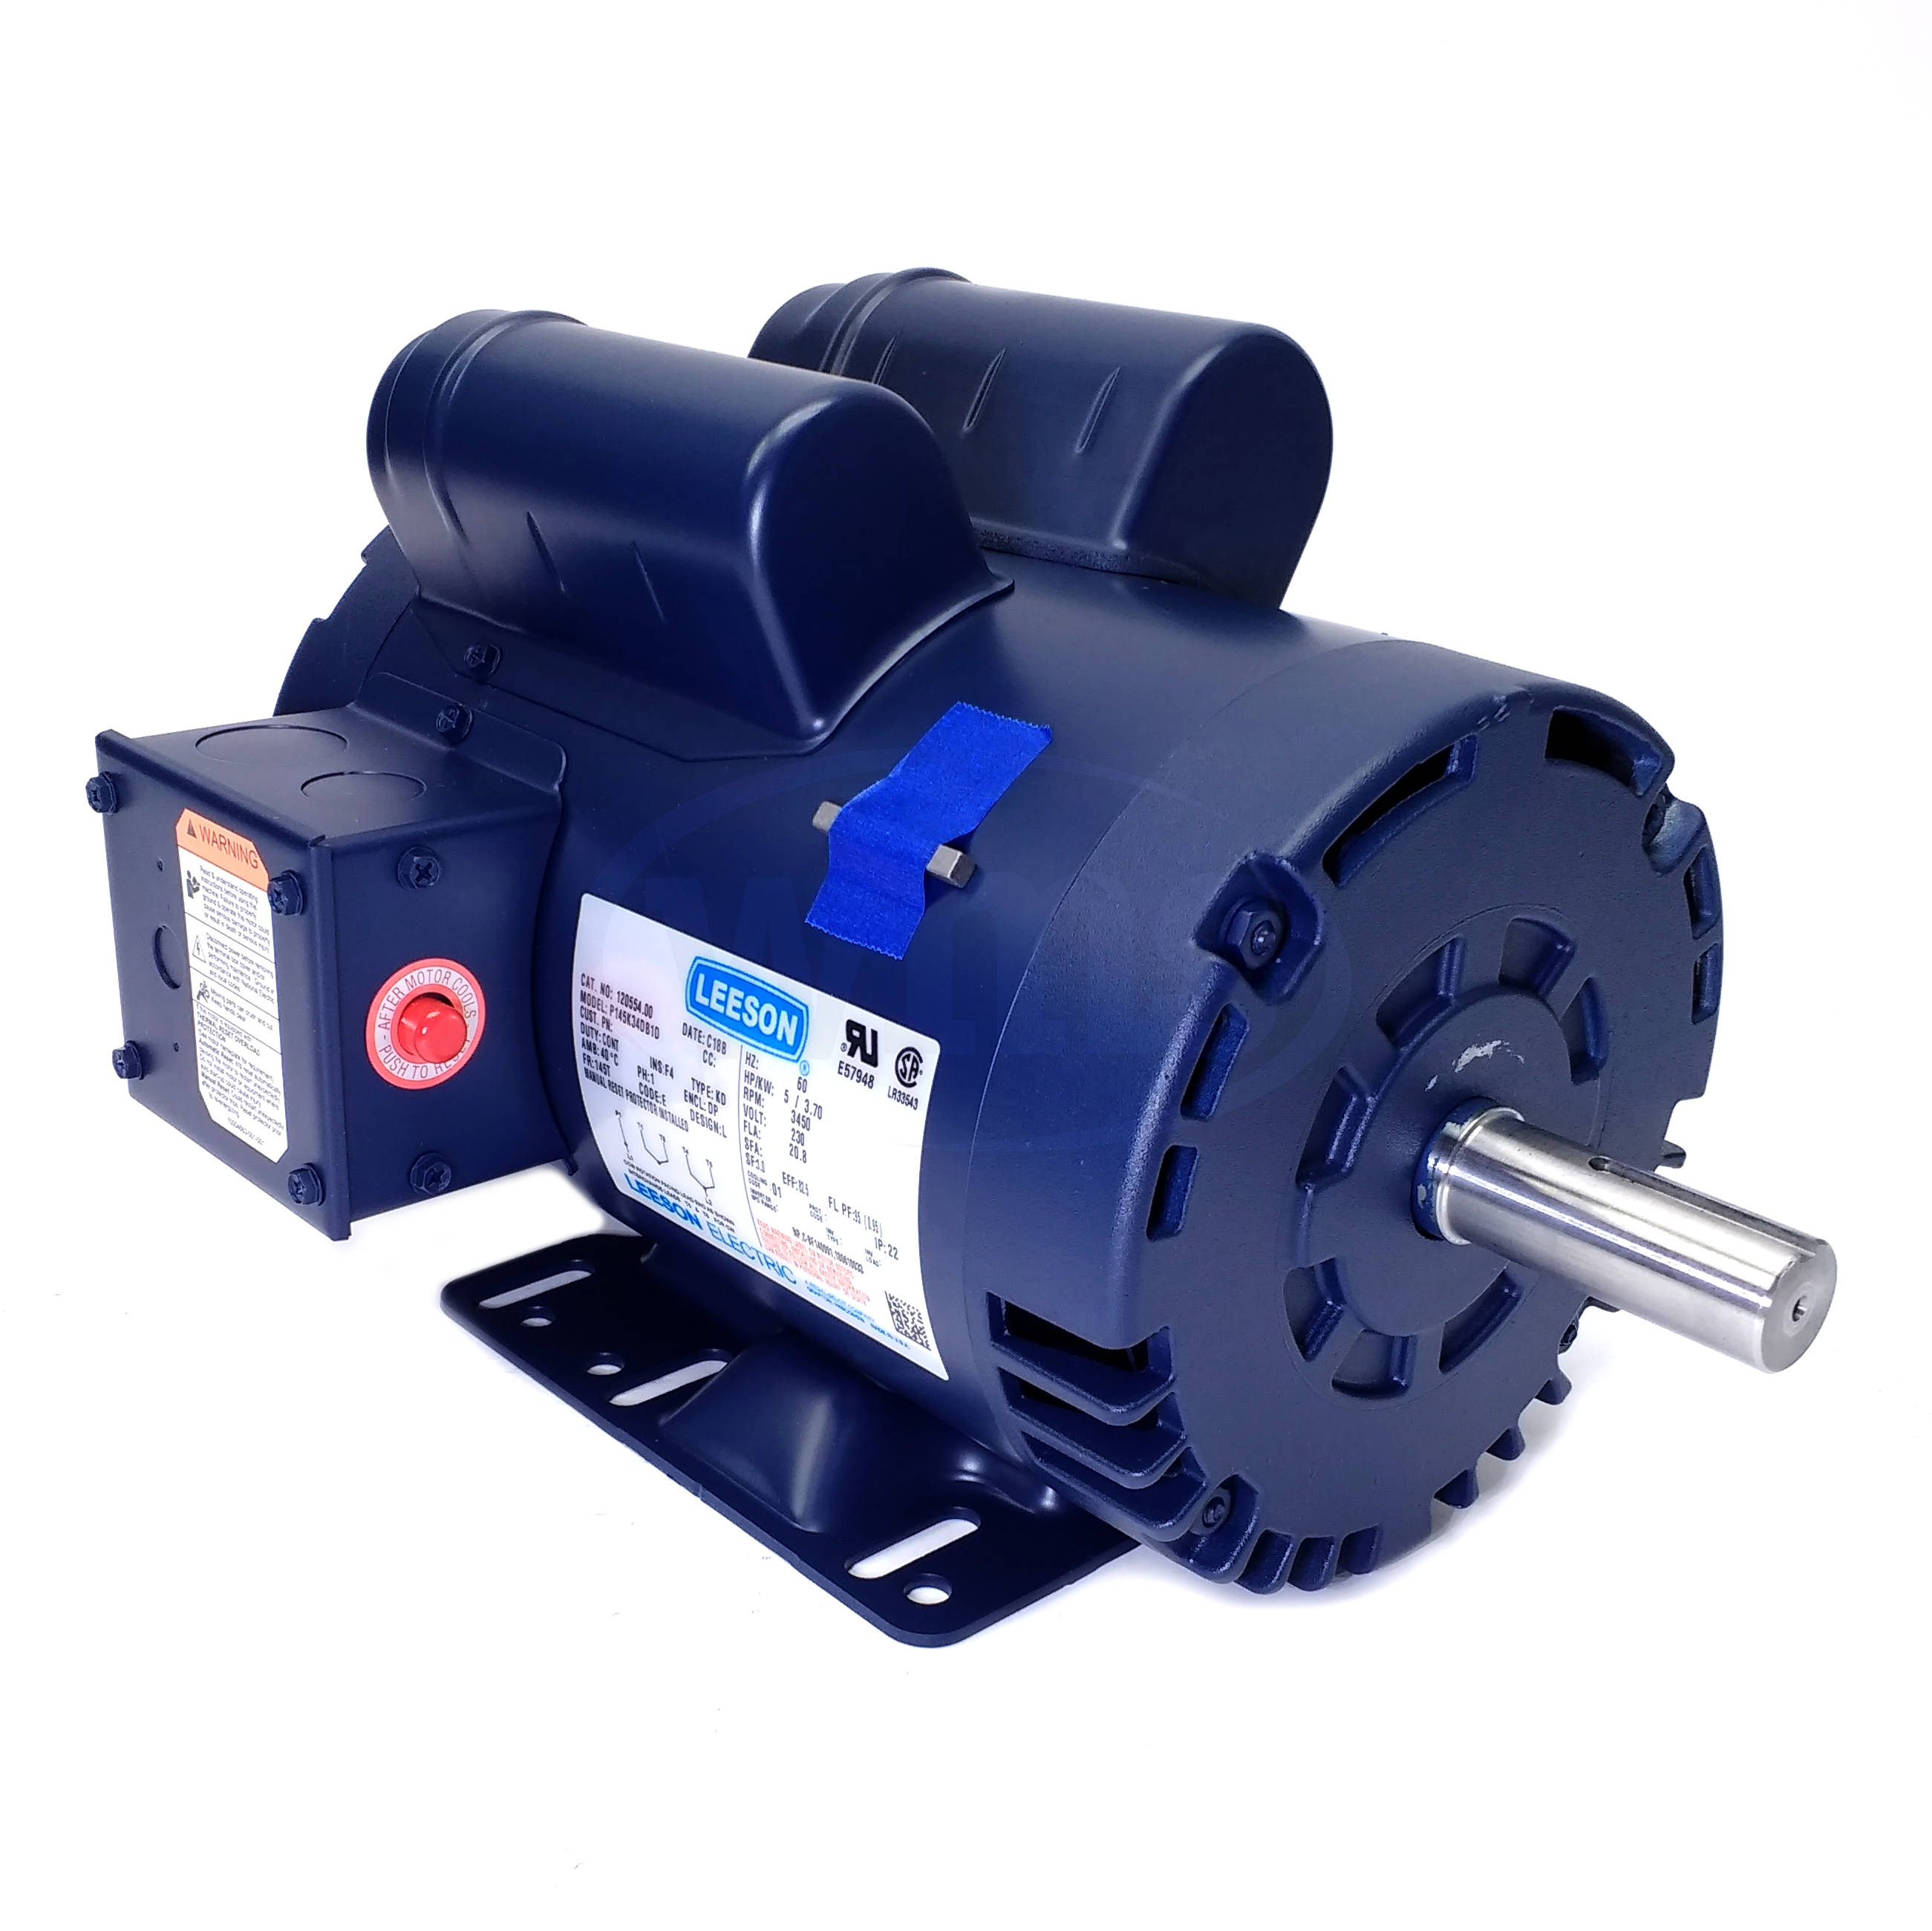 leeson 5 hp compressor motor wiring wiring diagram operations leeson 5 hp compressor motor wiring [ 2602 x 2601 Pixel ]